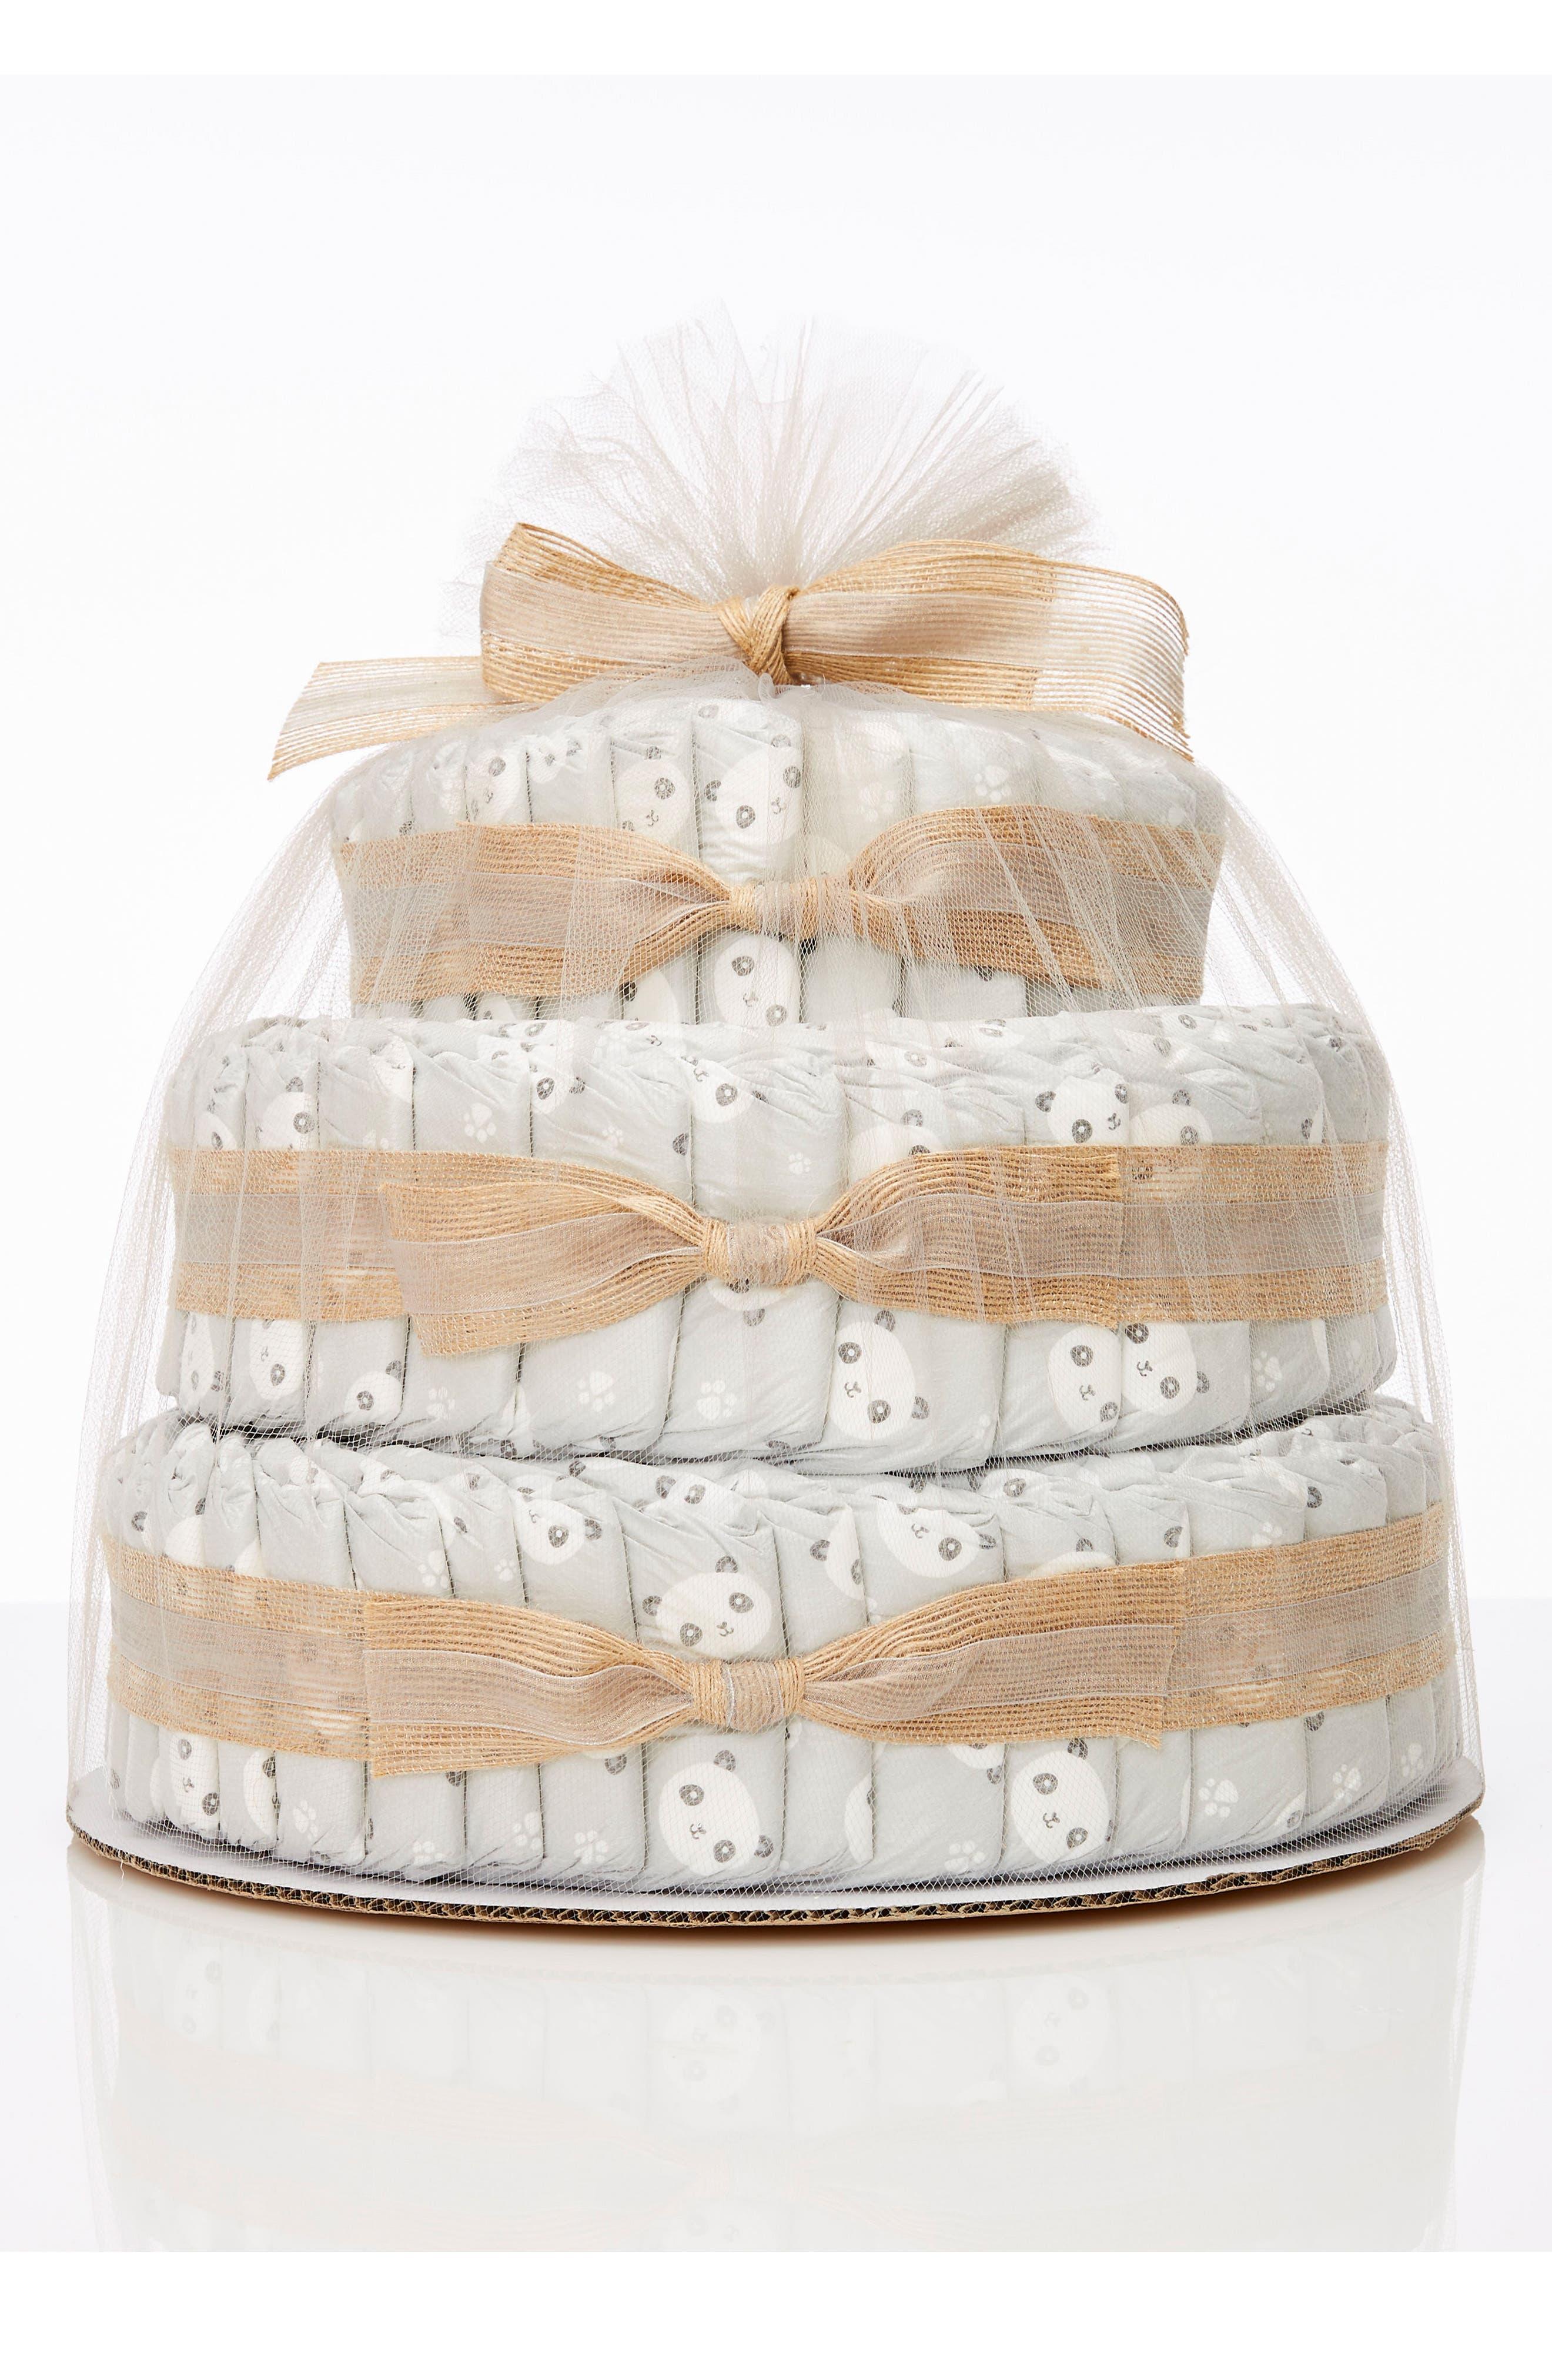 Large Diaper Cake & Full-Size Essentials Set,                         Main,                         color, Pandas